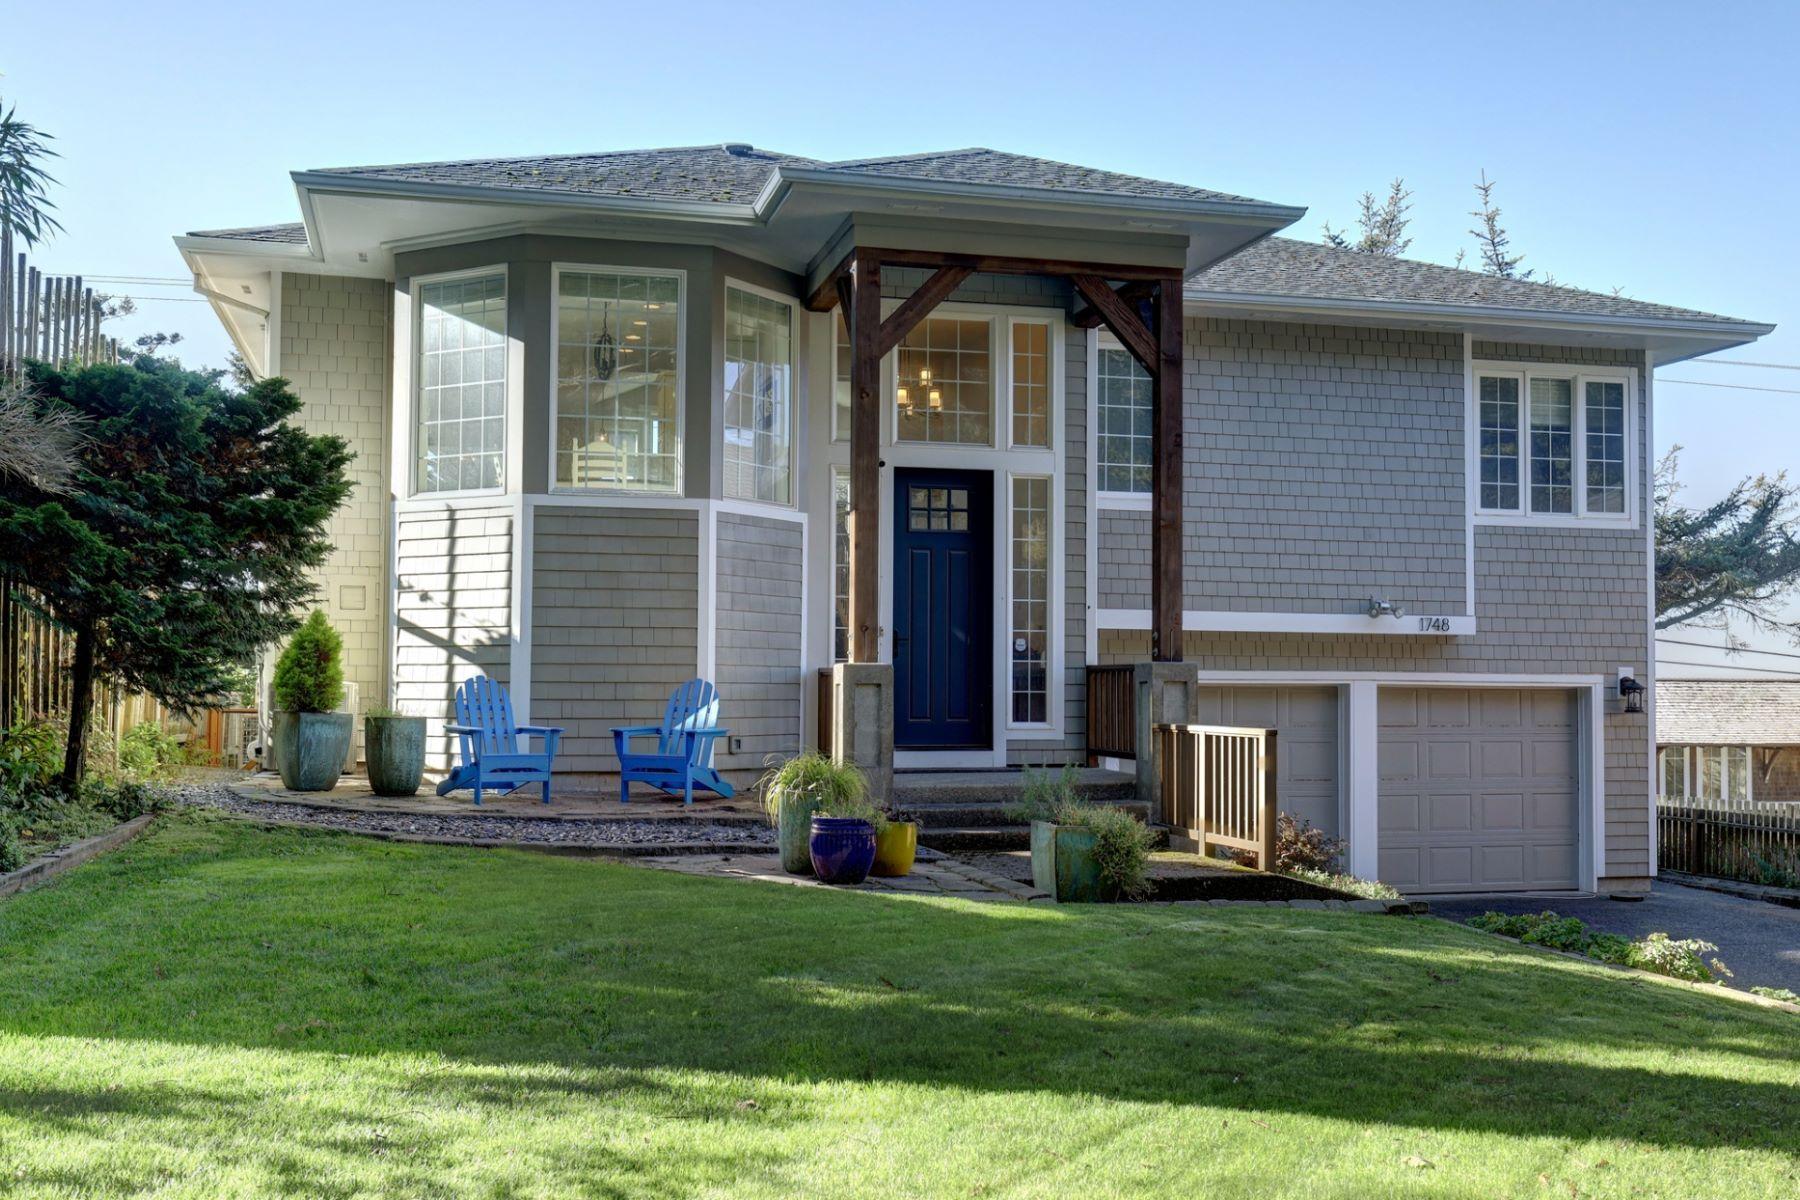 Other Residential Homes για την Πώληση στο 1748 View Point Terrace Cannon Beach, OR 97110 Cannon Beach, Ορεγκον 97110 Ηνωμένες Πολιτείες